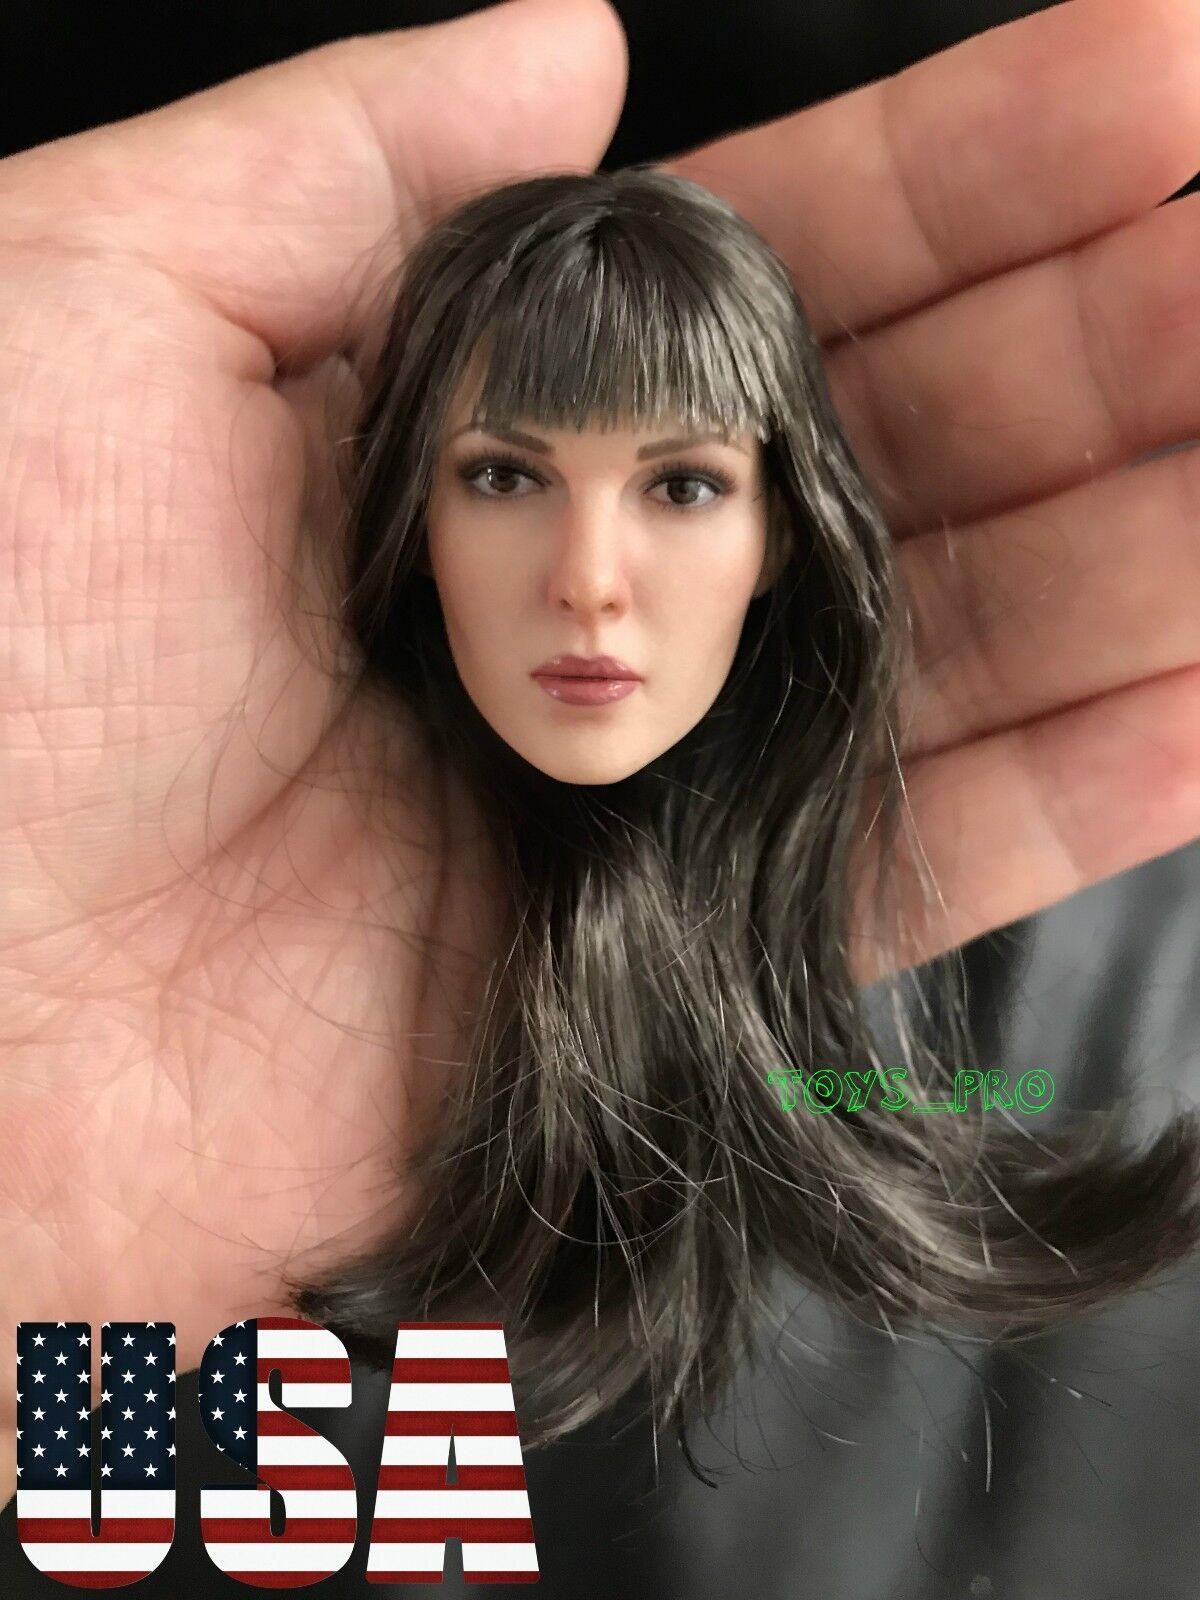 1 6 Female PALE Head Sculpt Long Hair For 12'' PHICEN Figure KT0011 A ❶USA❶